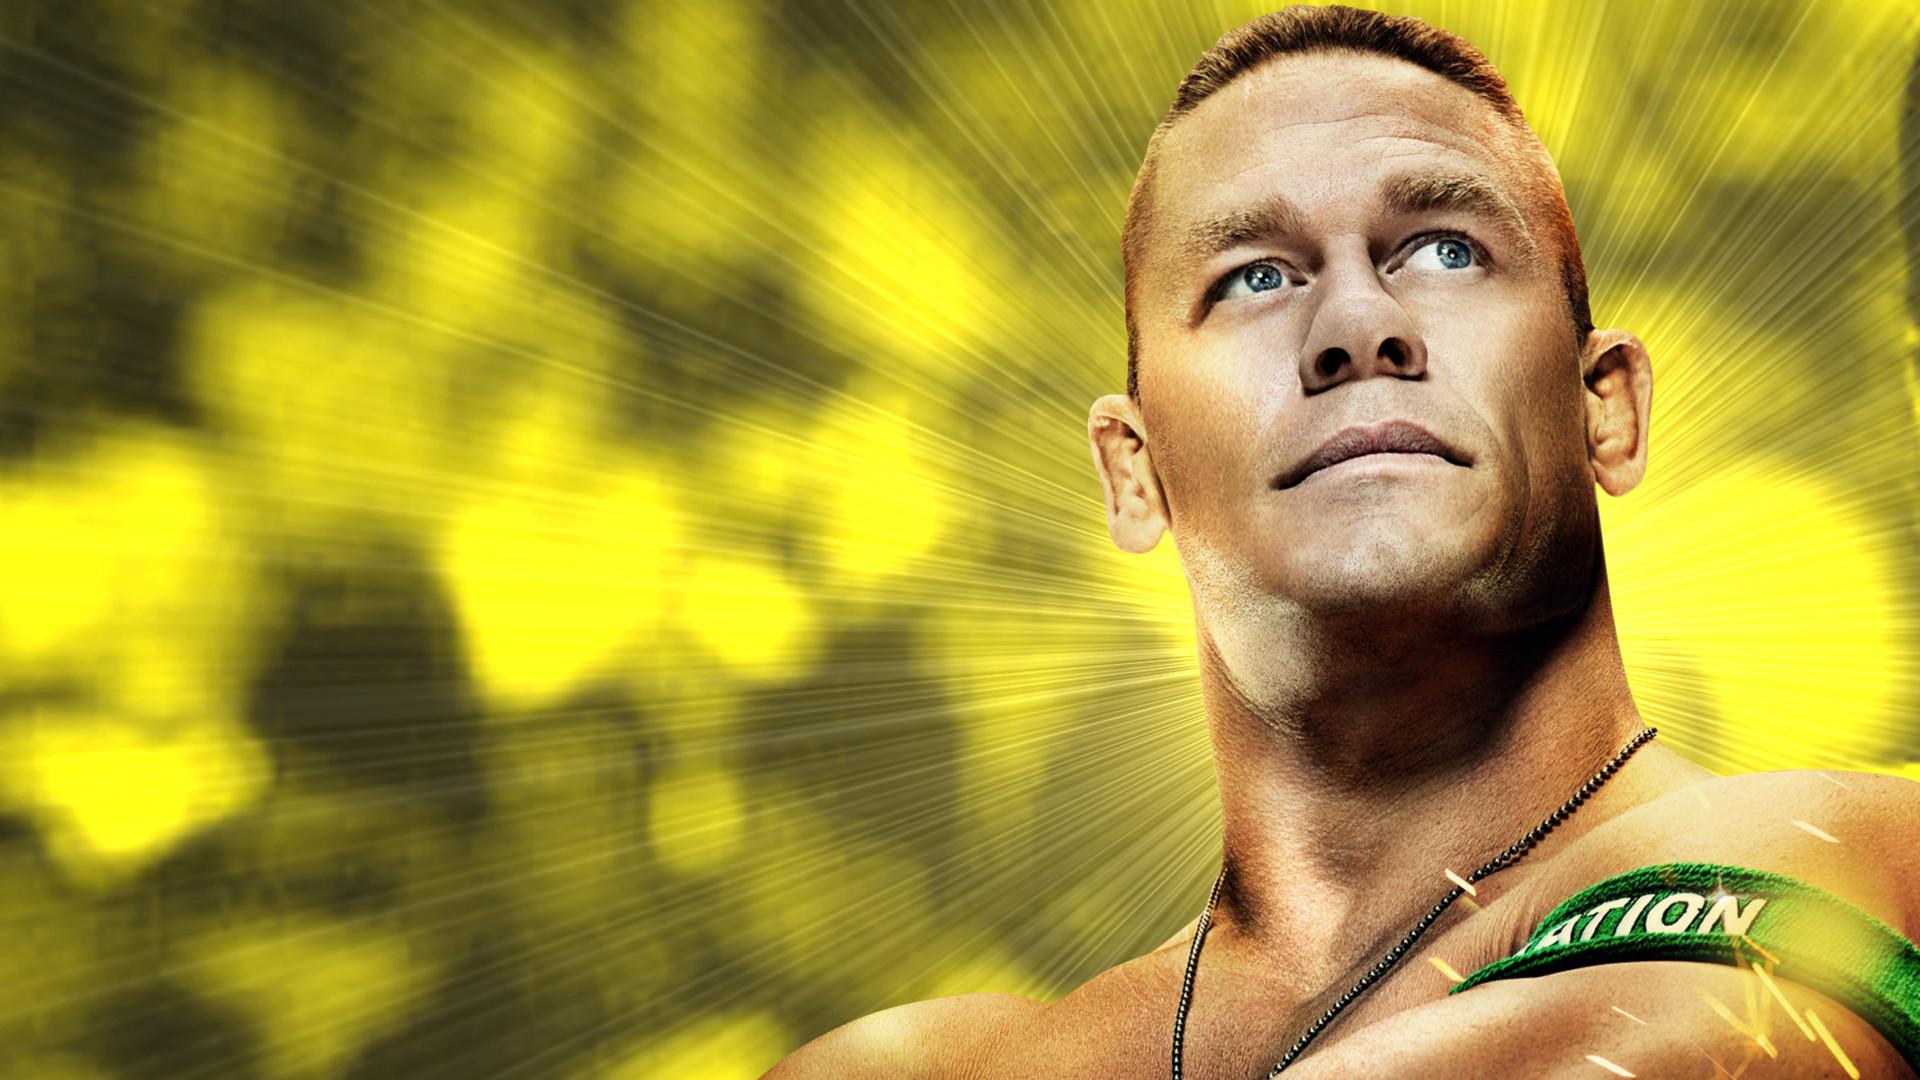 0 John Cena Wallpapers HD Pixels Talk John Cena Wallpapers